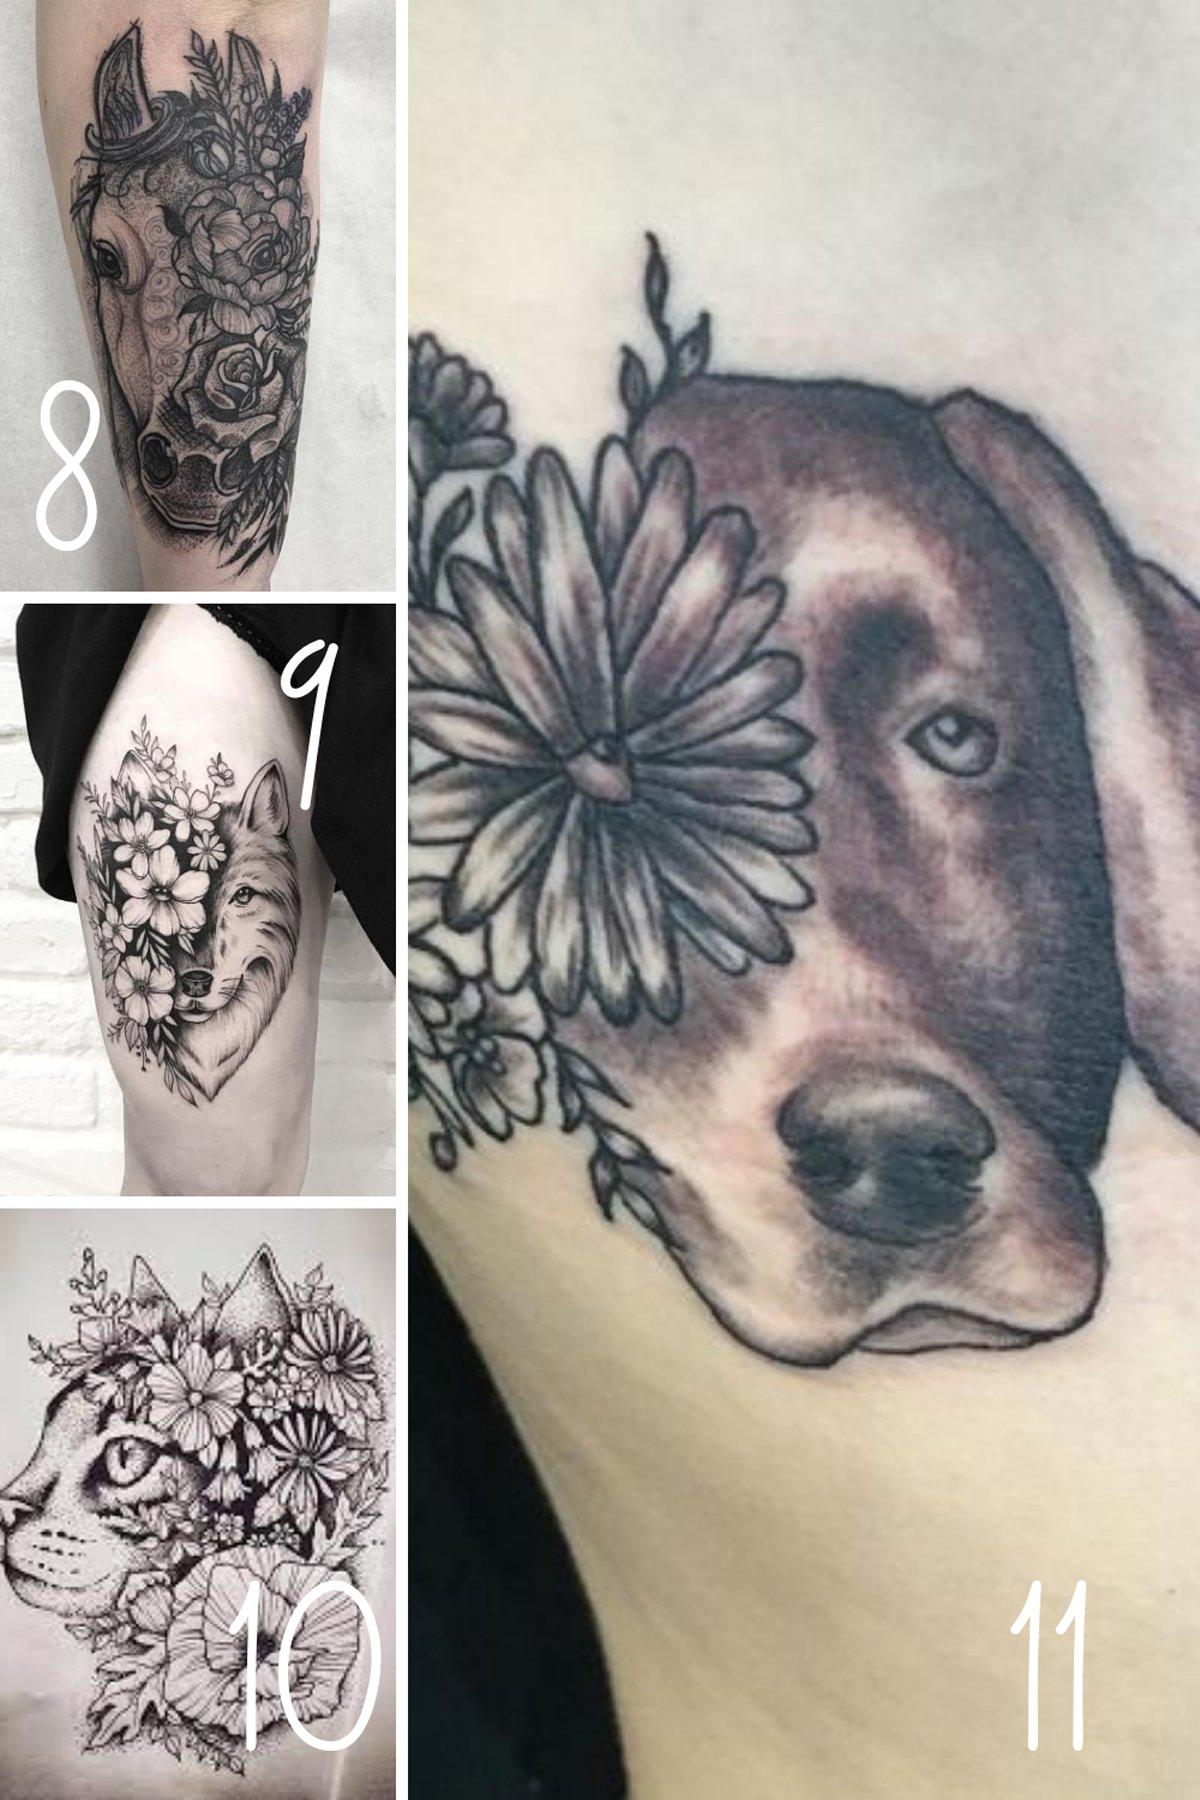 Dog face tattoo half face flower